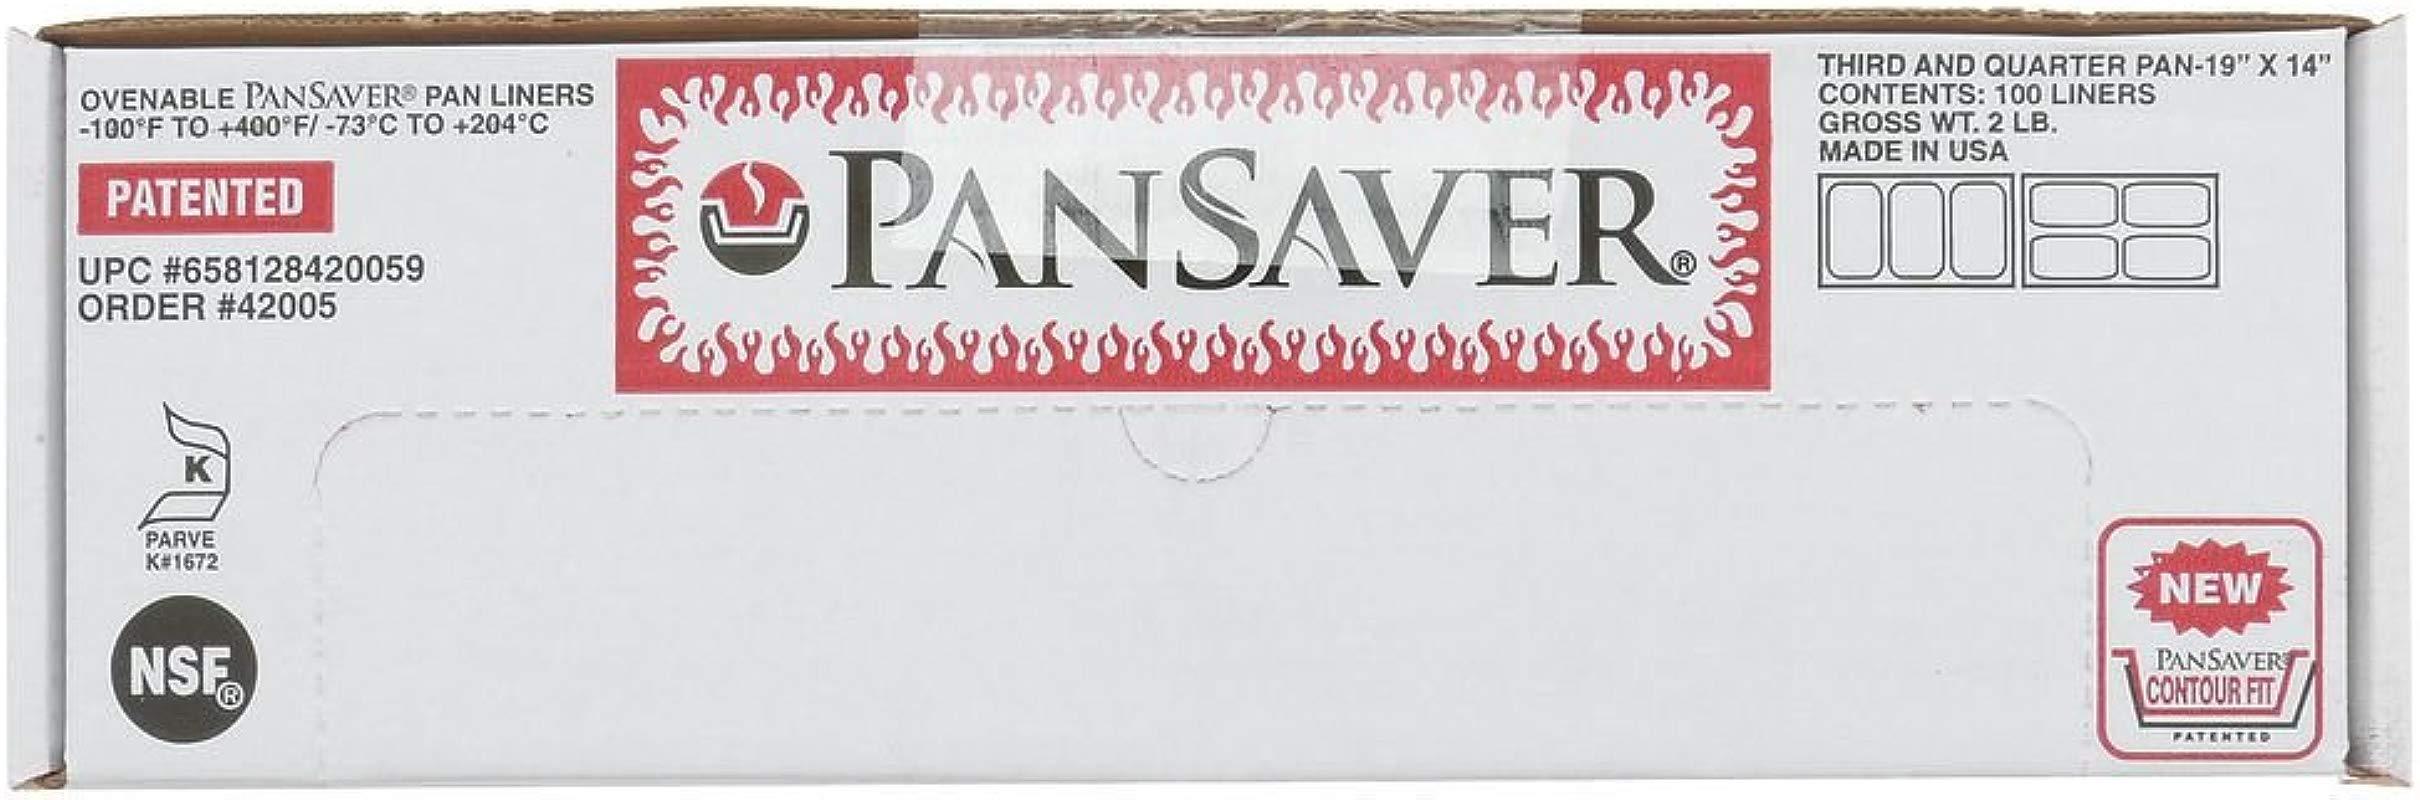 PanSaver Monolyn 1 3 Size Steam Table Pan Liner Clear Plastic 4 6 D 100 Per Case